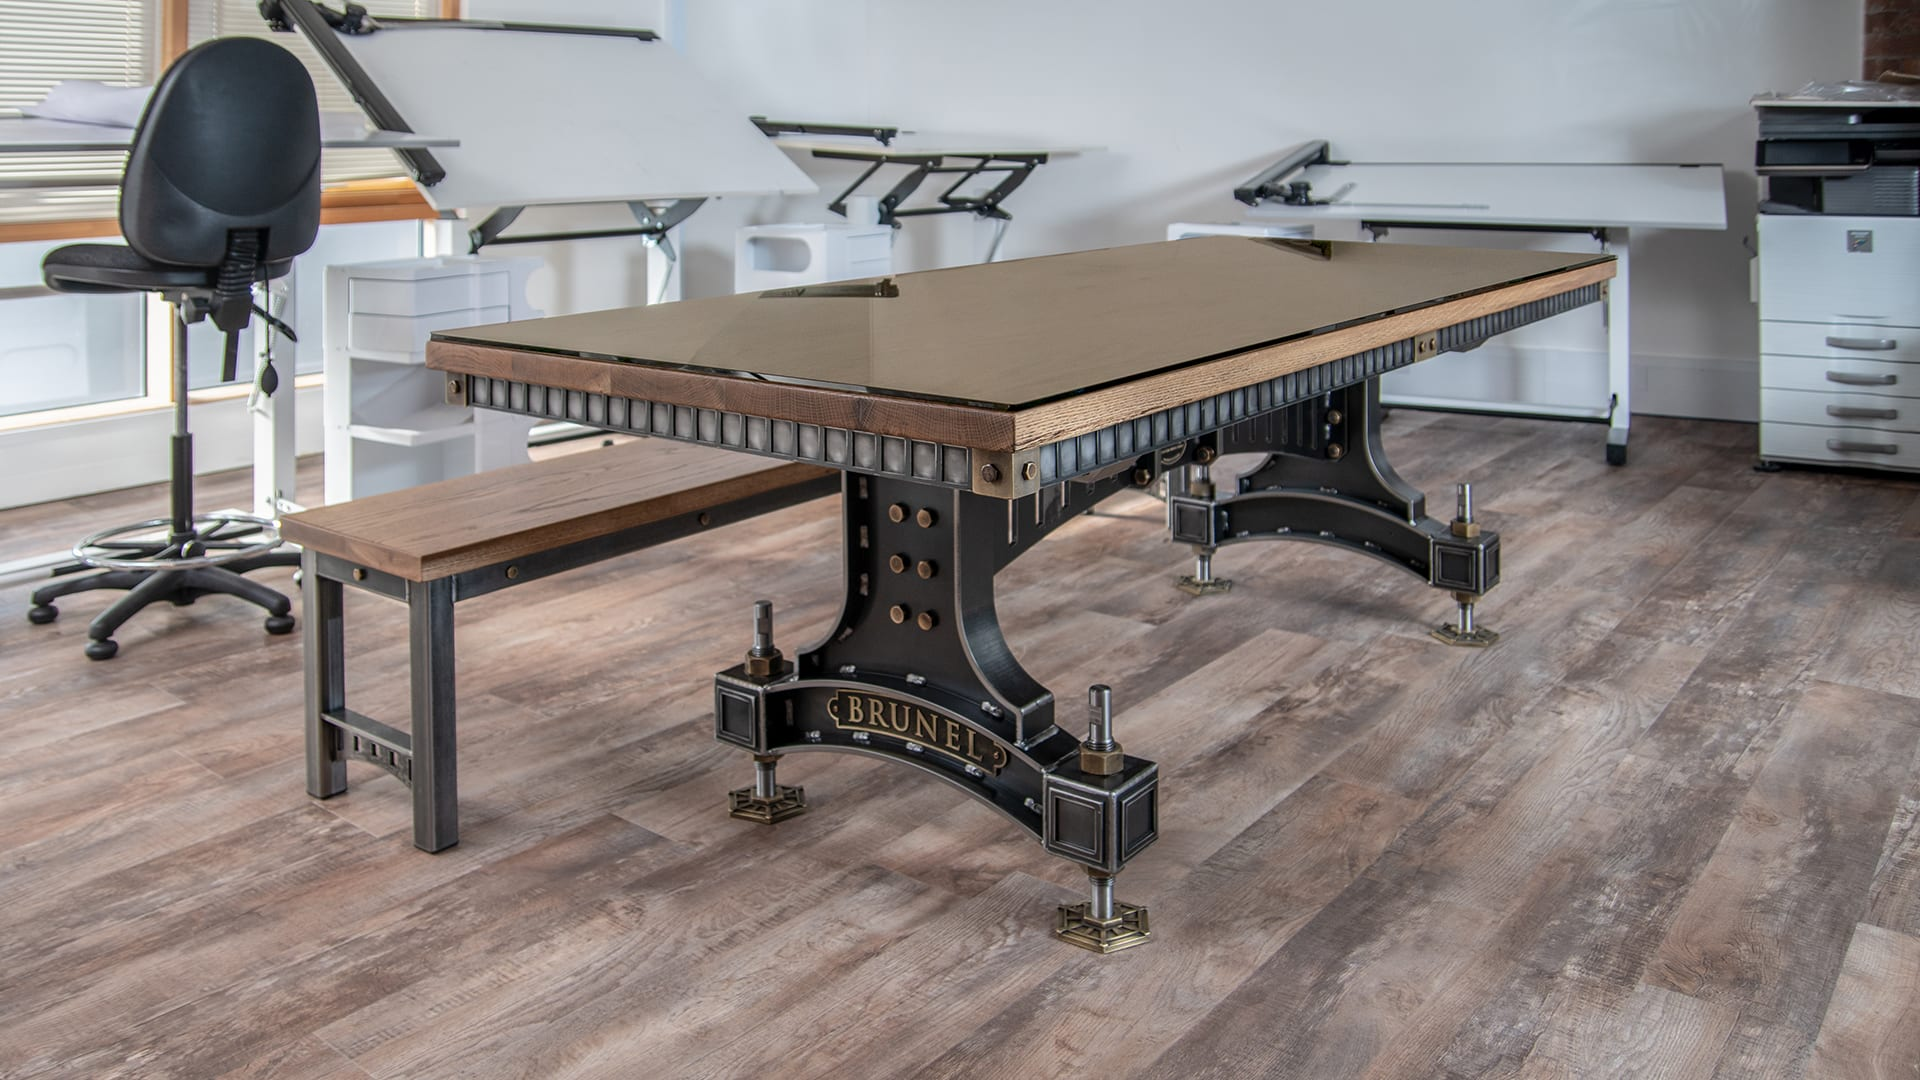 Steel Vintage - Brunel Table - Industrial Furniture